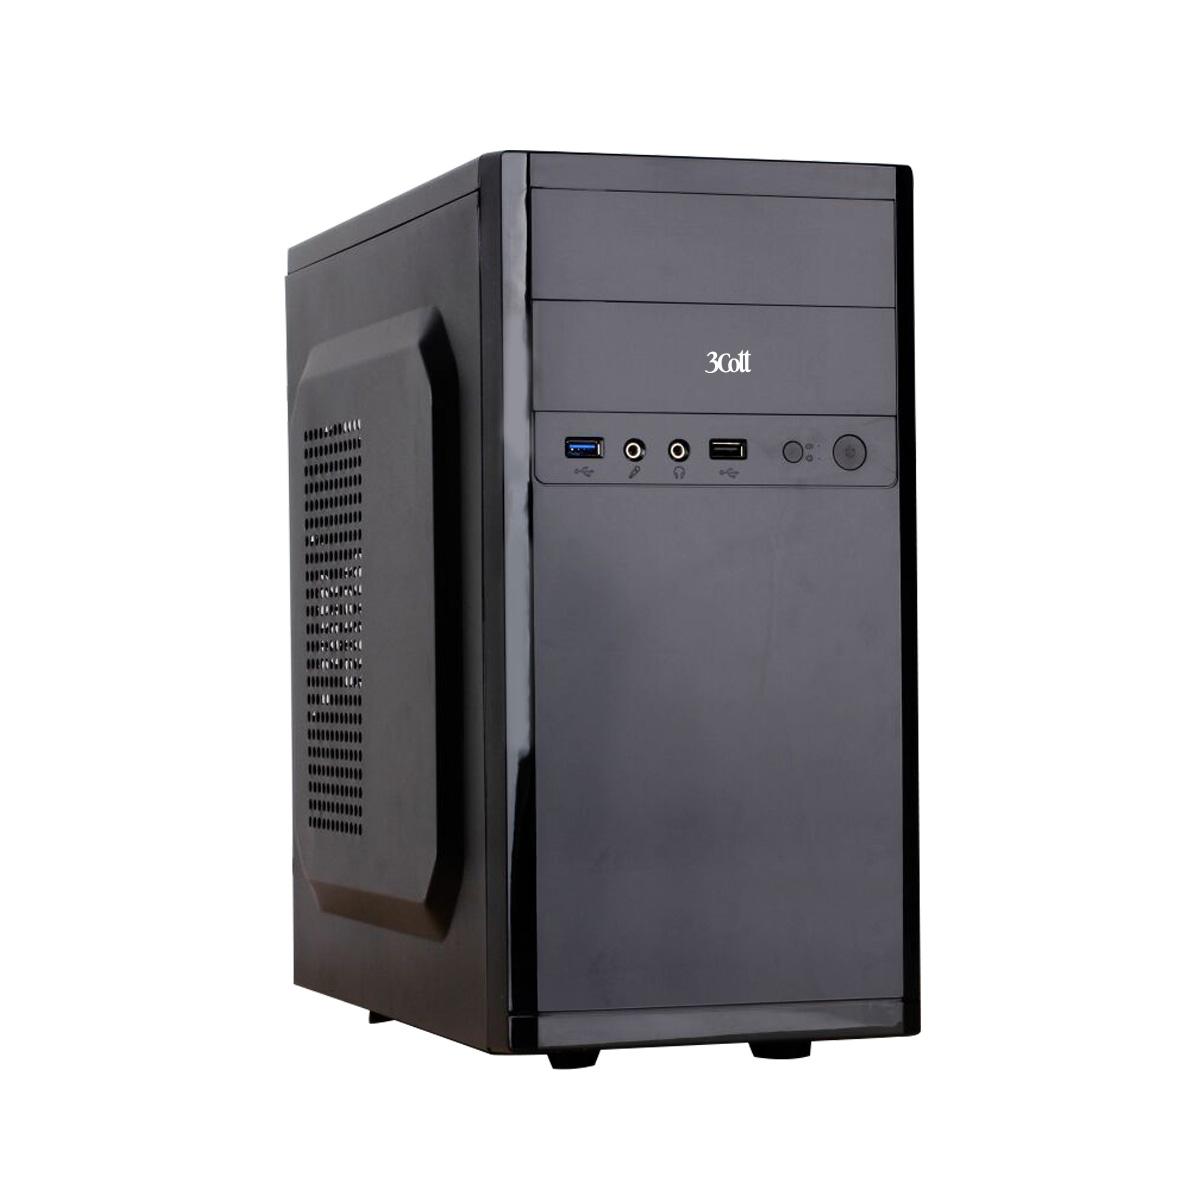 Компьютер Office 130 R (2018) >INTEL PENTIUM G4400, 4096 Mb, INTEL HD GRAPH. 510, 1000 HDD, NO DVD, OS